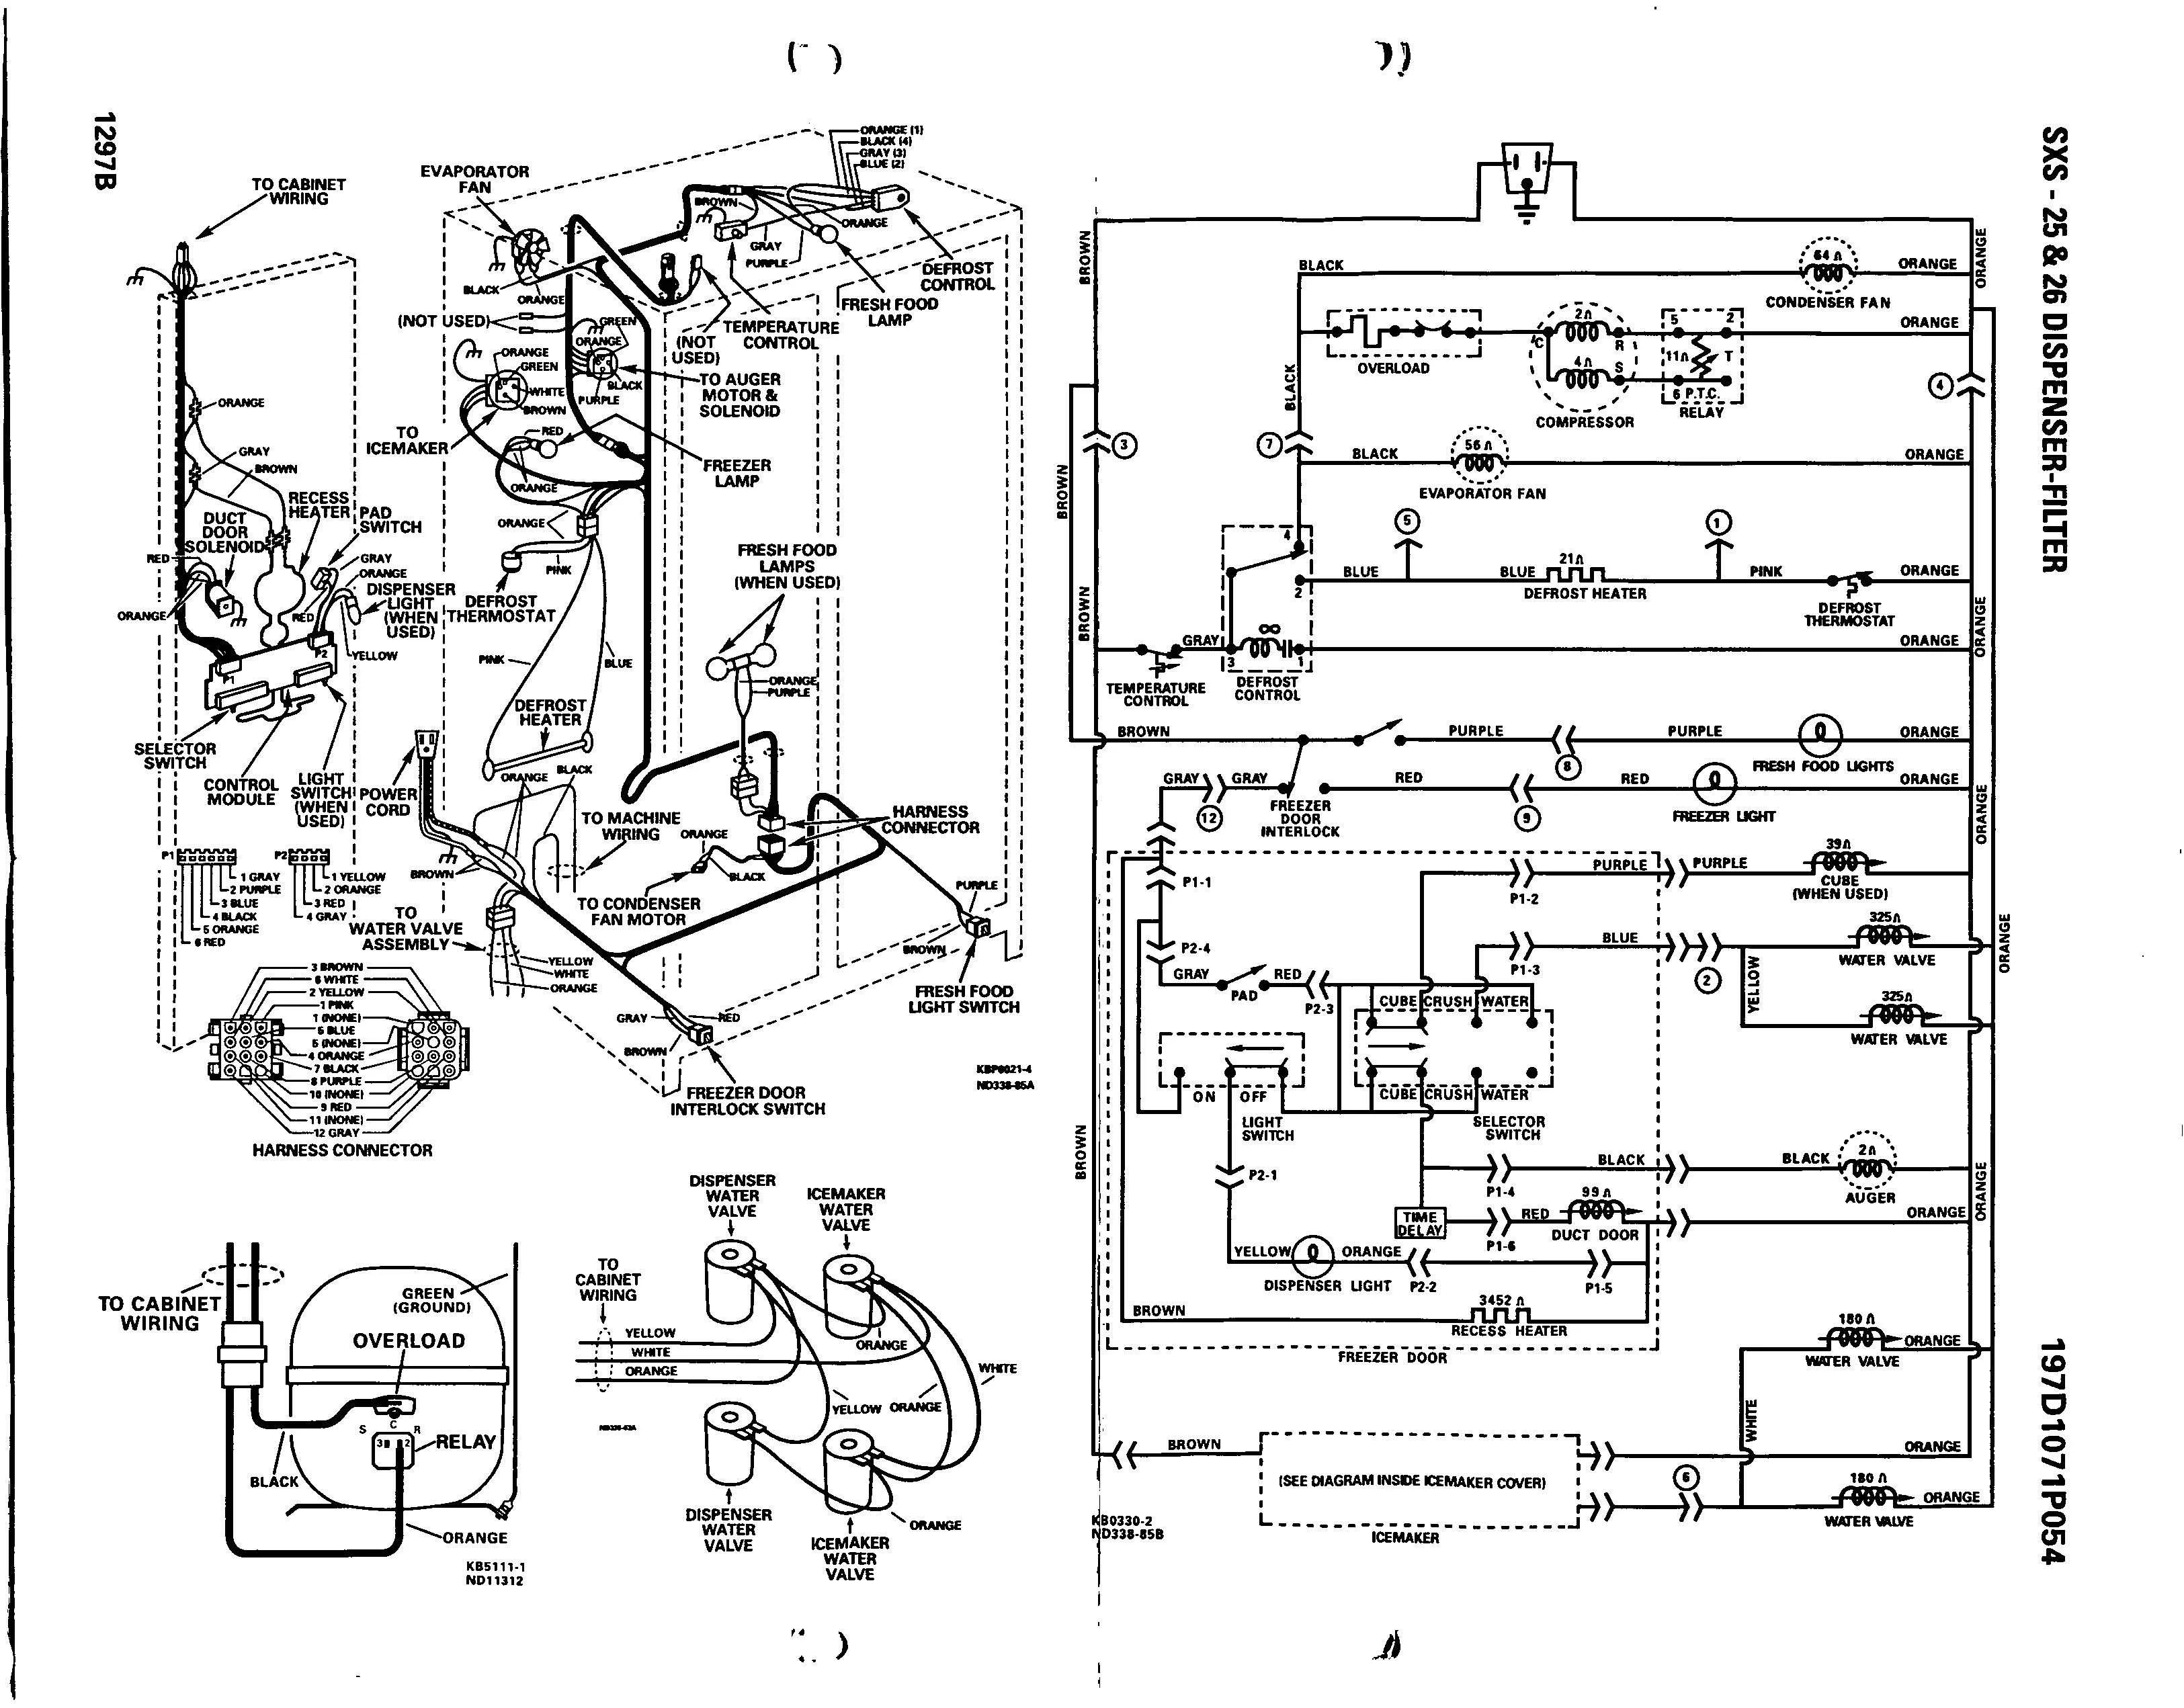 Ge Ptac Wiring Diagram Model Az35 - 2003 Ford Mustang Gt Fuel Filter -  sucinyaa.sia2.yangfamilytaichi.it   Ge Ptac Wiring Diagram Model Az35      The Most Complete Wiring Diagram